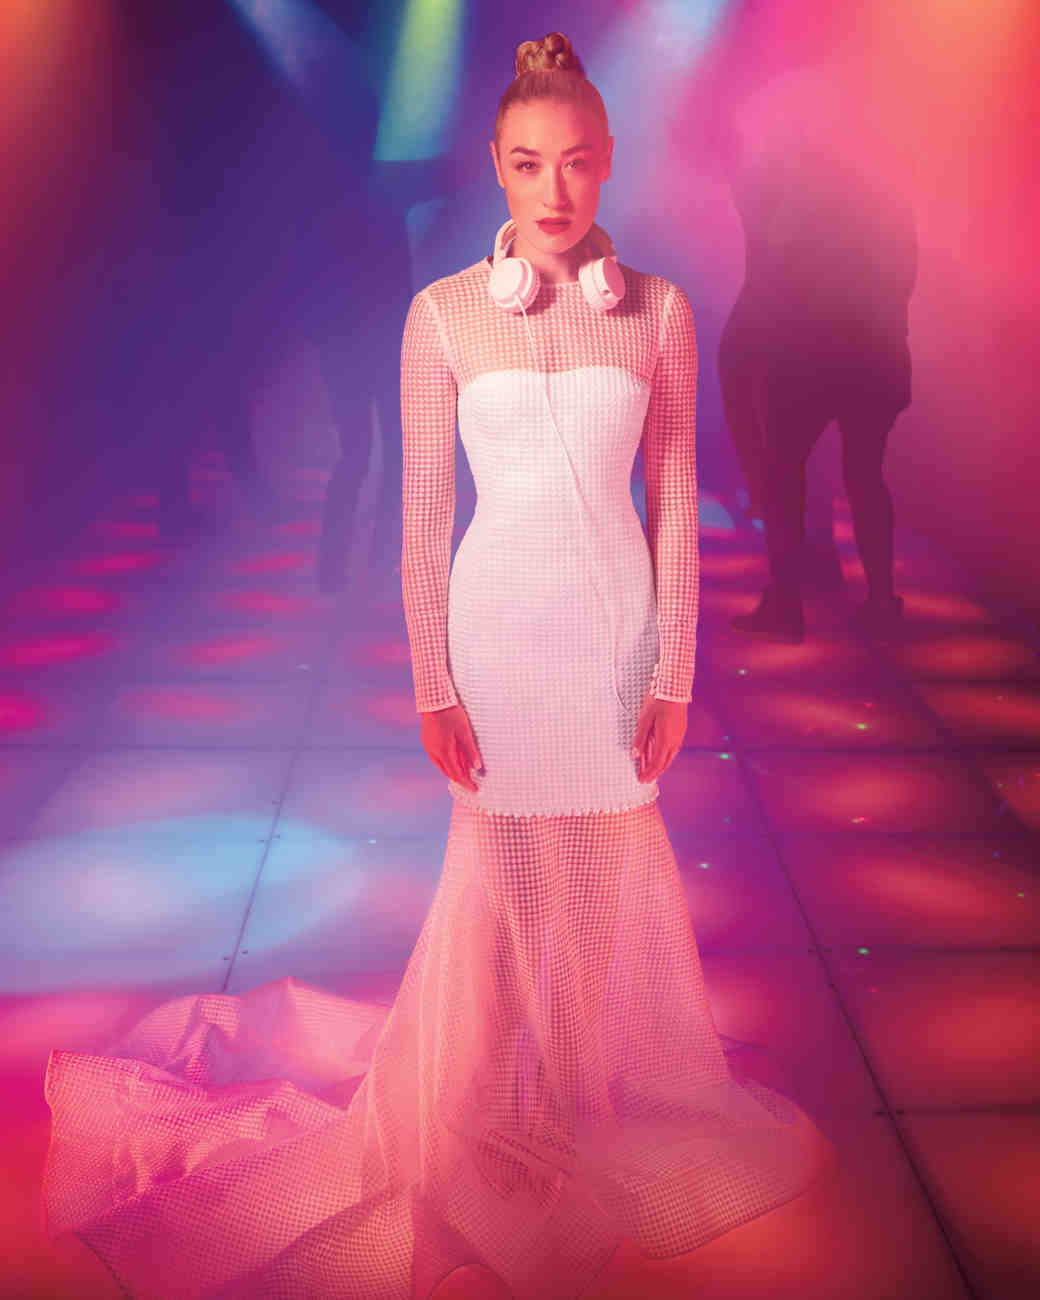 wedding-fashion-house-1660-1588-1692-1693-final-d111290.jpg